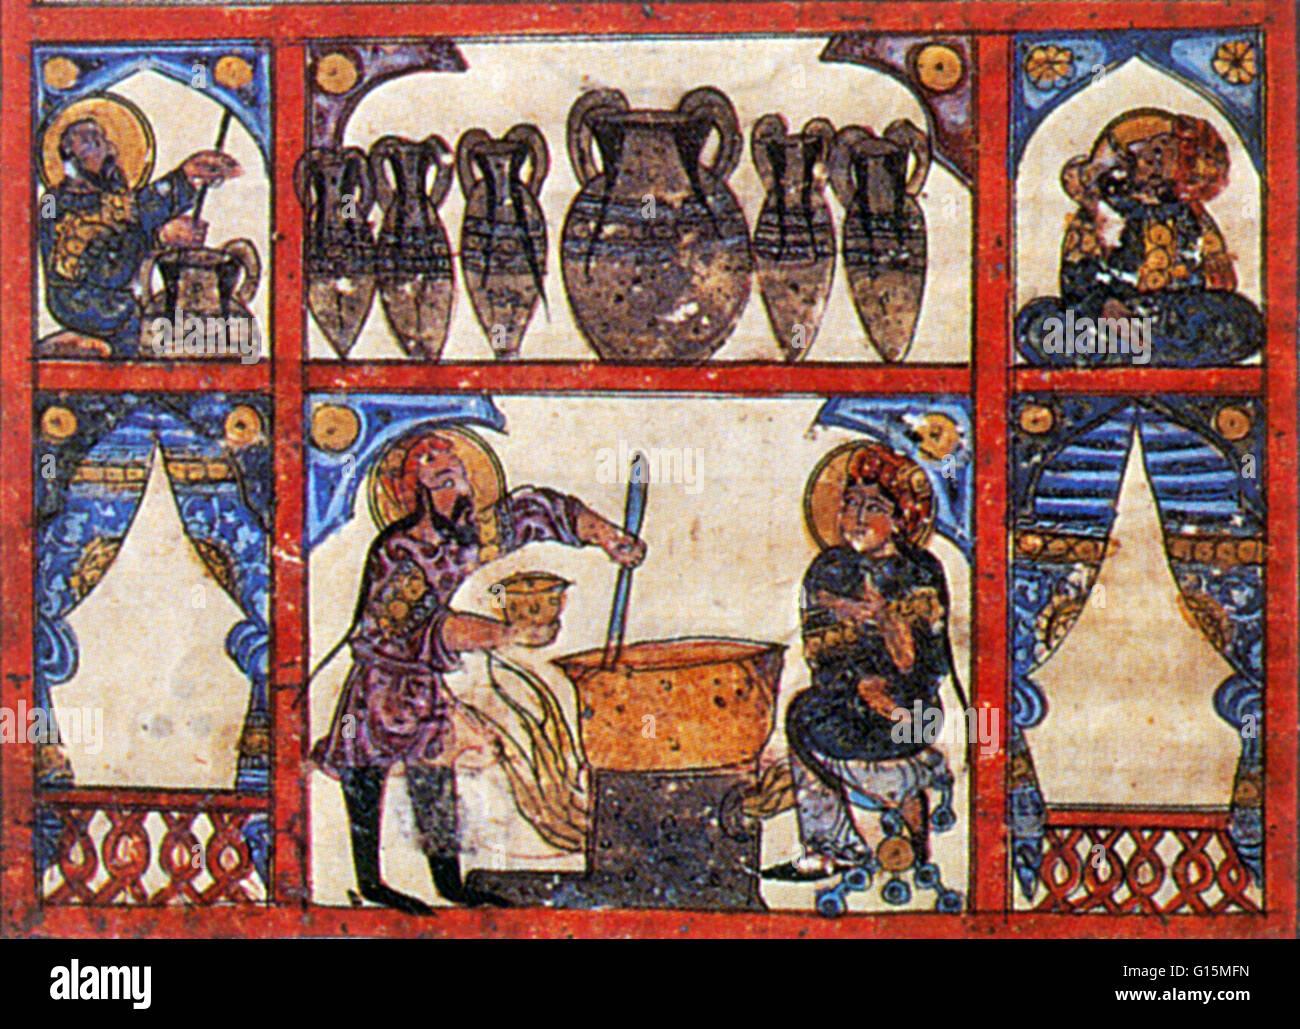 arabic artwork entitled the